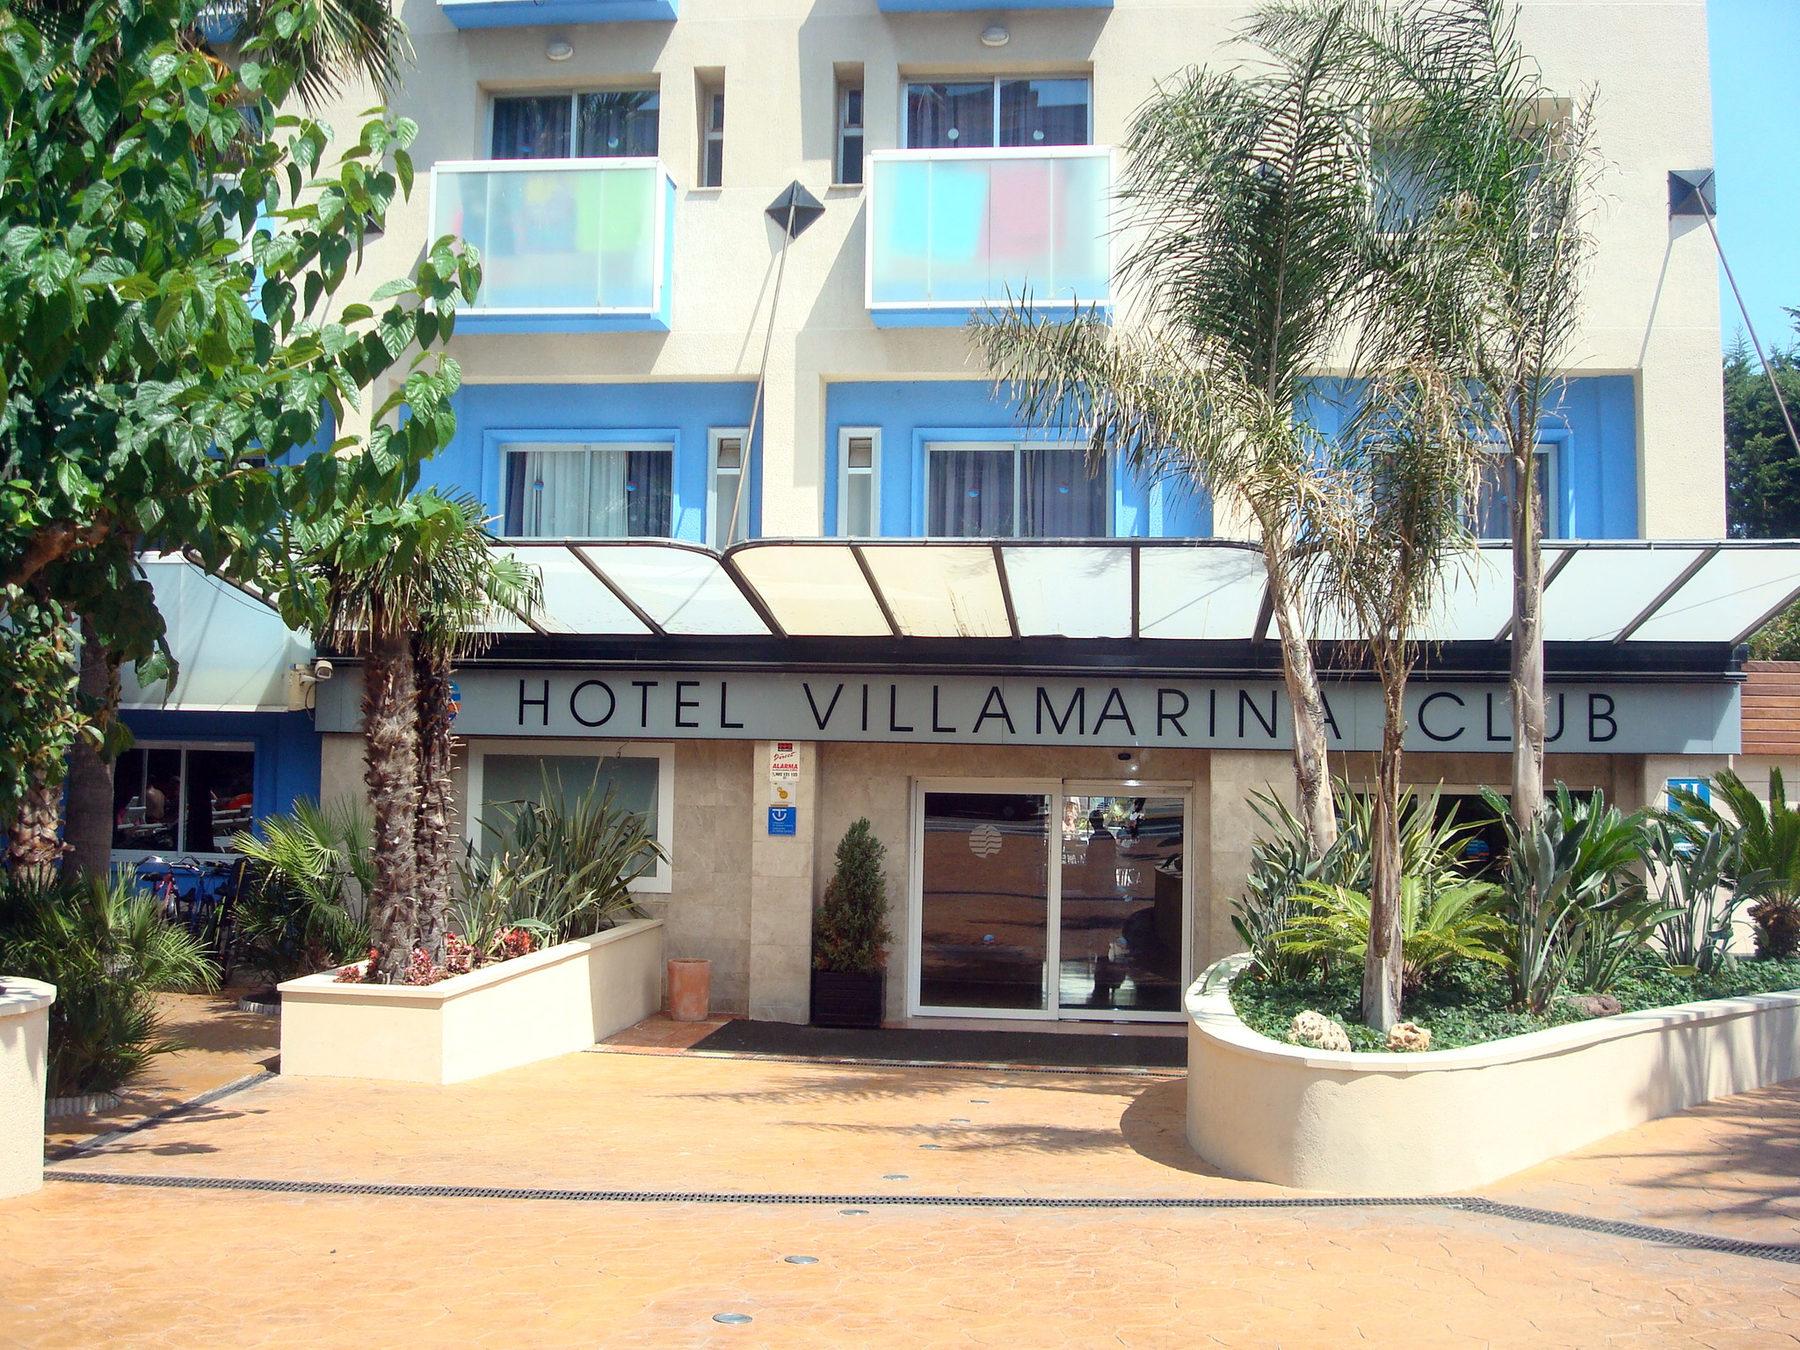 Villamarina Club